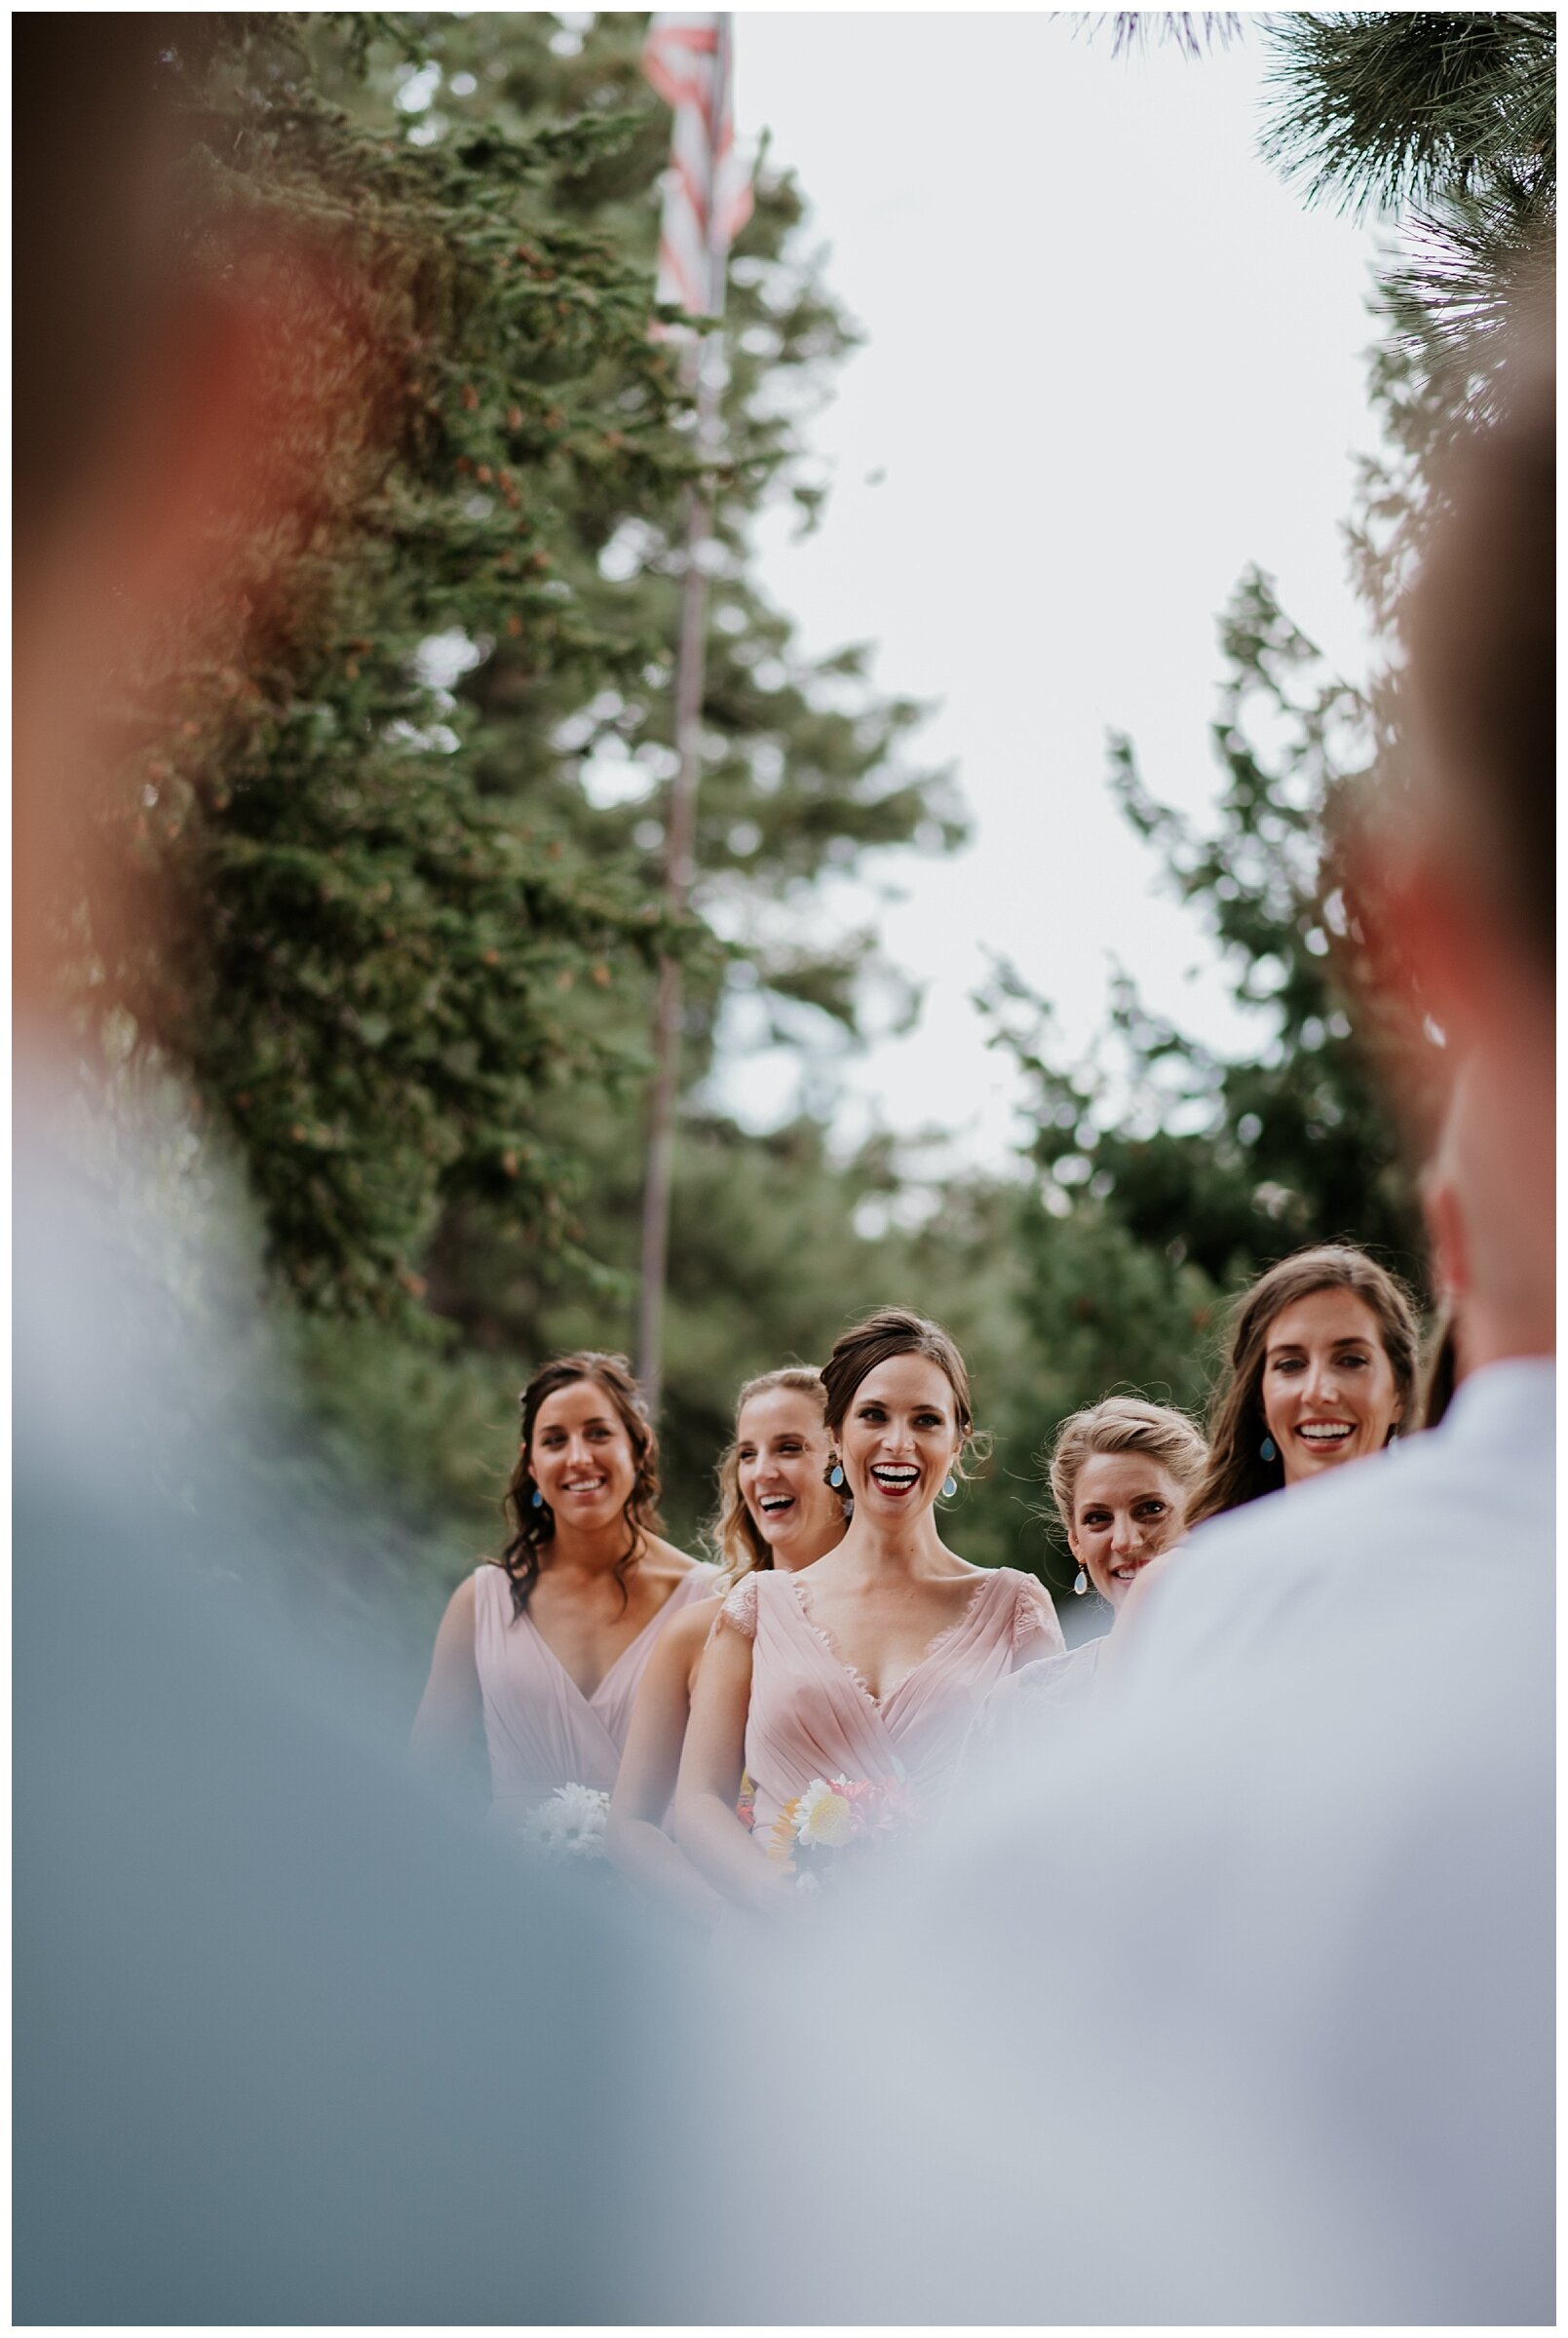 chief hosa wedding, colorful wedding, mismatched bridesmaids dresses, wedding in colorado, denver wedding photographer, colorado wedding photographer, denver wedding videographer and photographer, colorado wedding videographer, denver wedding videographer, Small Colorado Wedding Photographer, Colorado Elopement Photographer